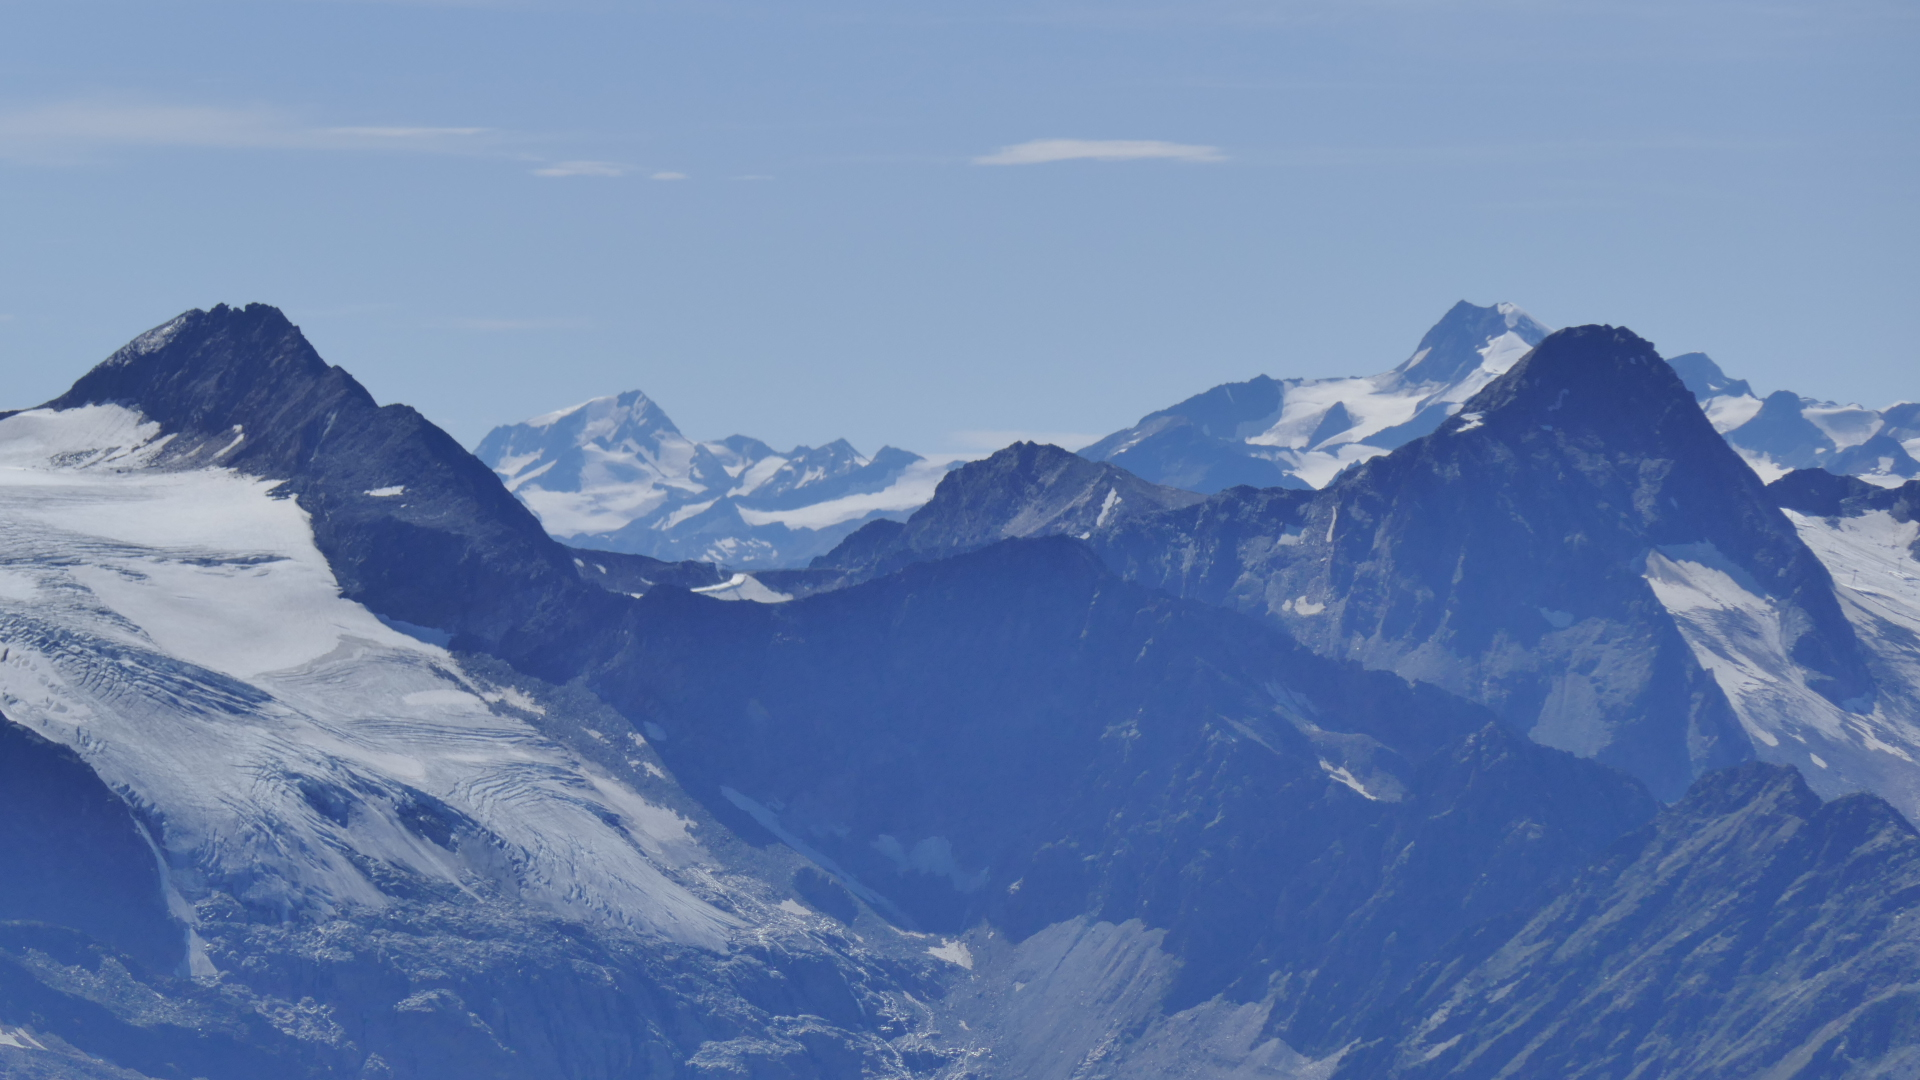 Aperer Pfaff - Weißkugel - rechts Schaufelspitze vor Wildspitze